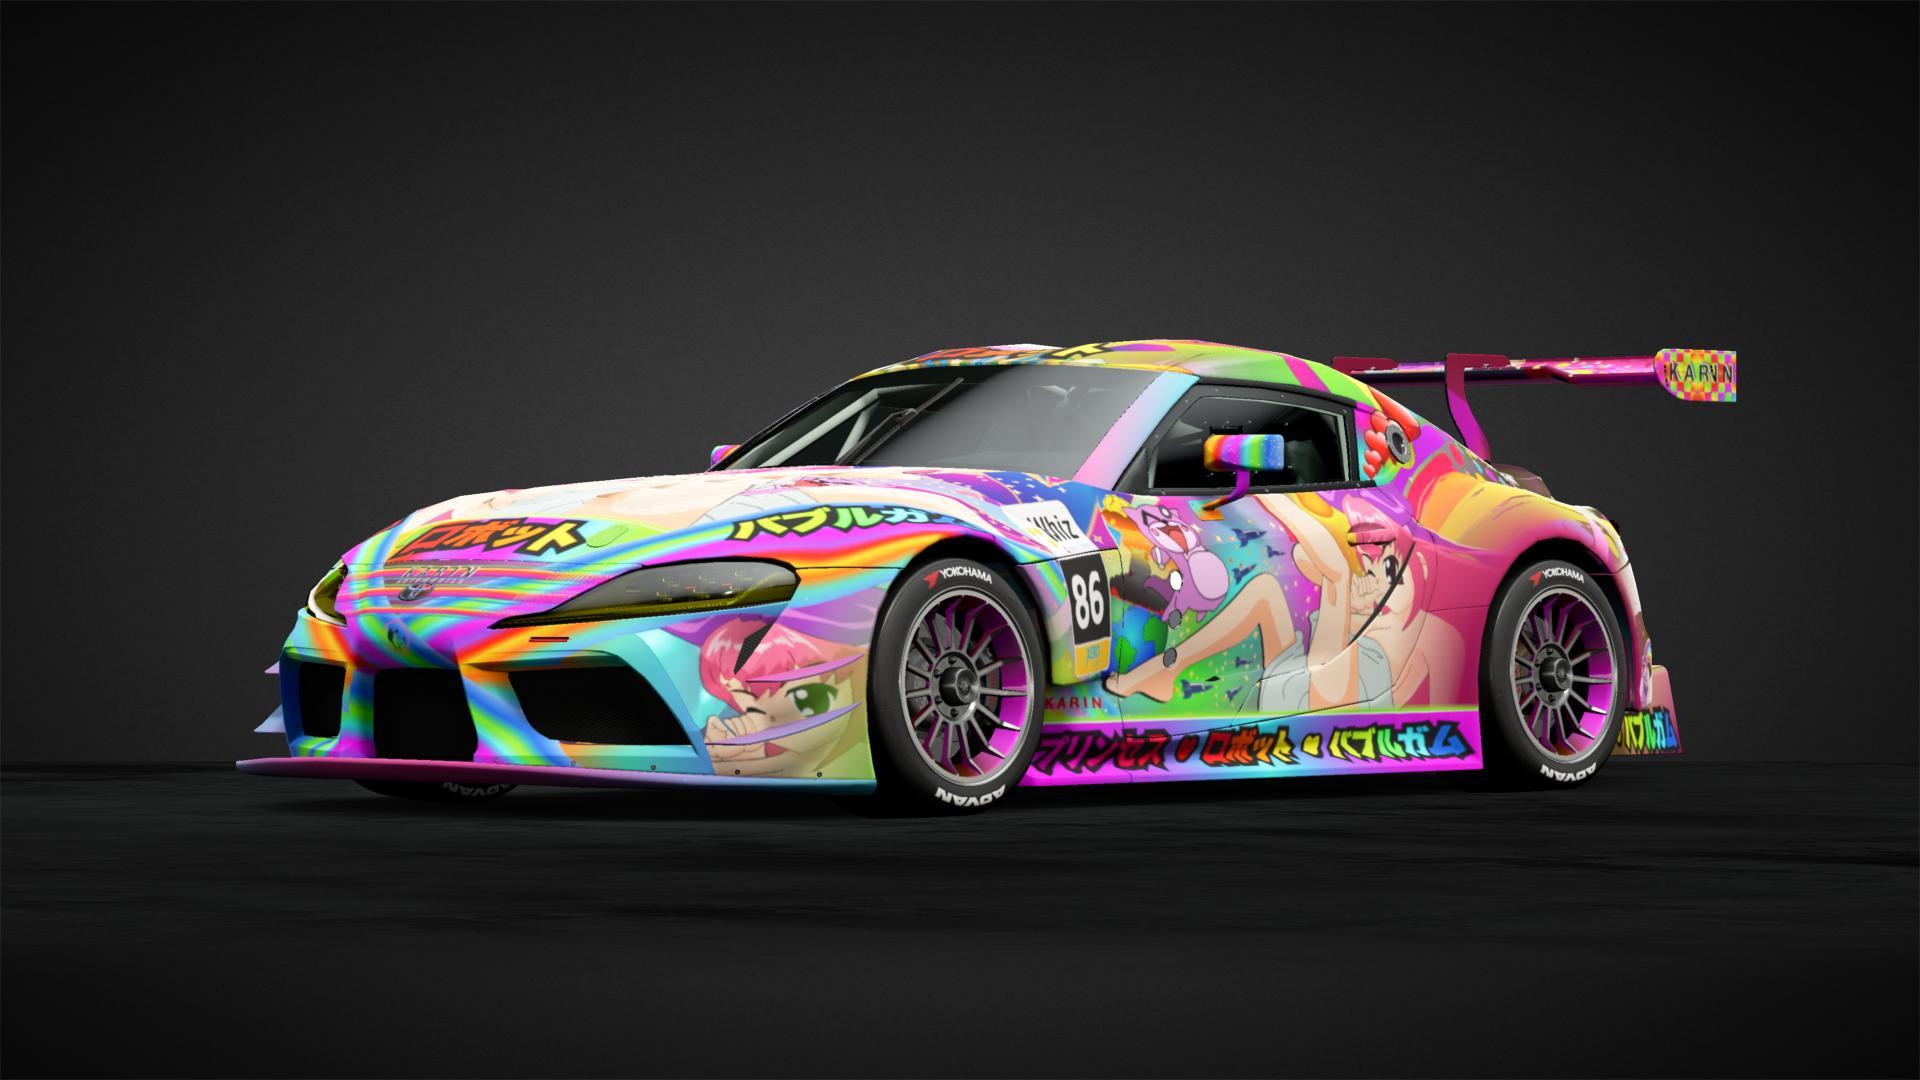 Gta V Car With Anime Livery / All gta online anime